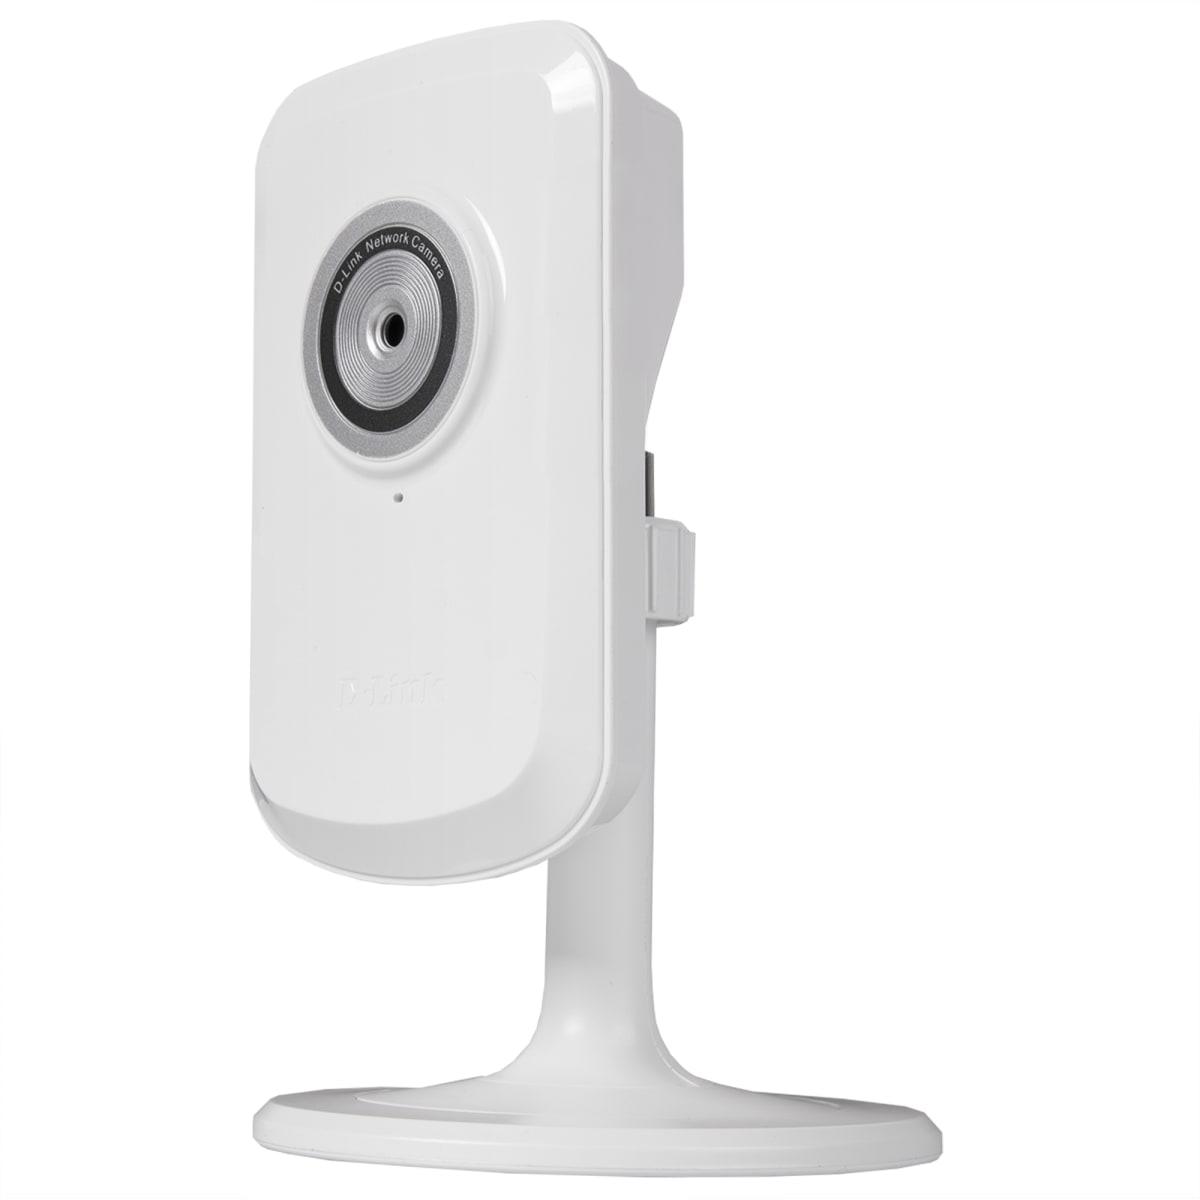 IP Камера внутренняя D-Link Стандарт DCS-930L